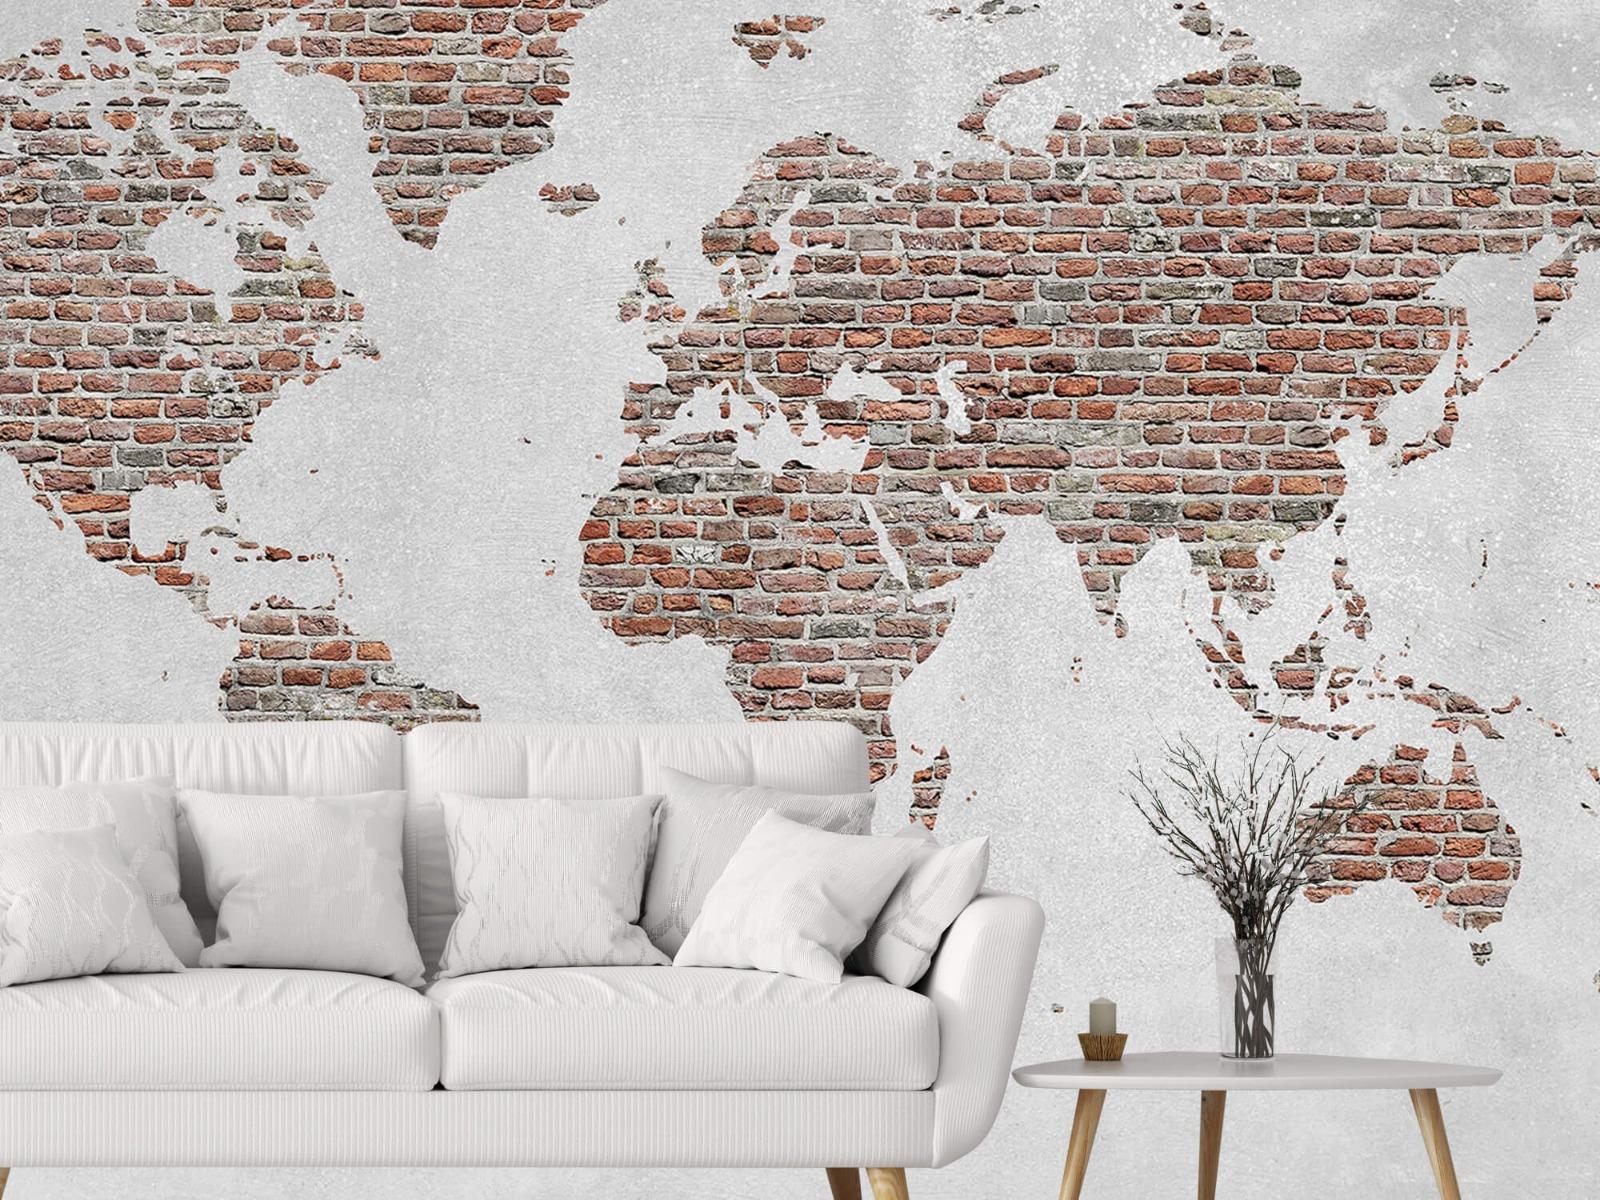 Steen behang - Wereldkaart stenen - Slaapkamer 2